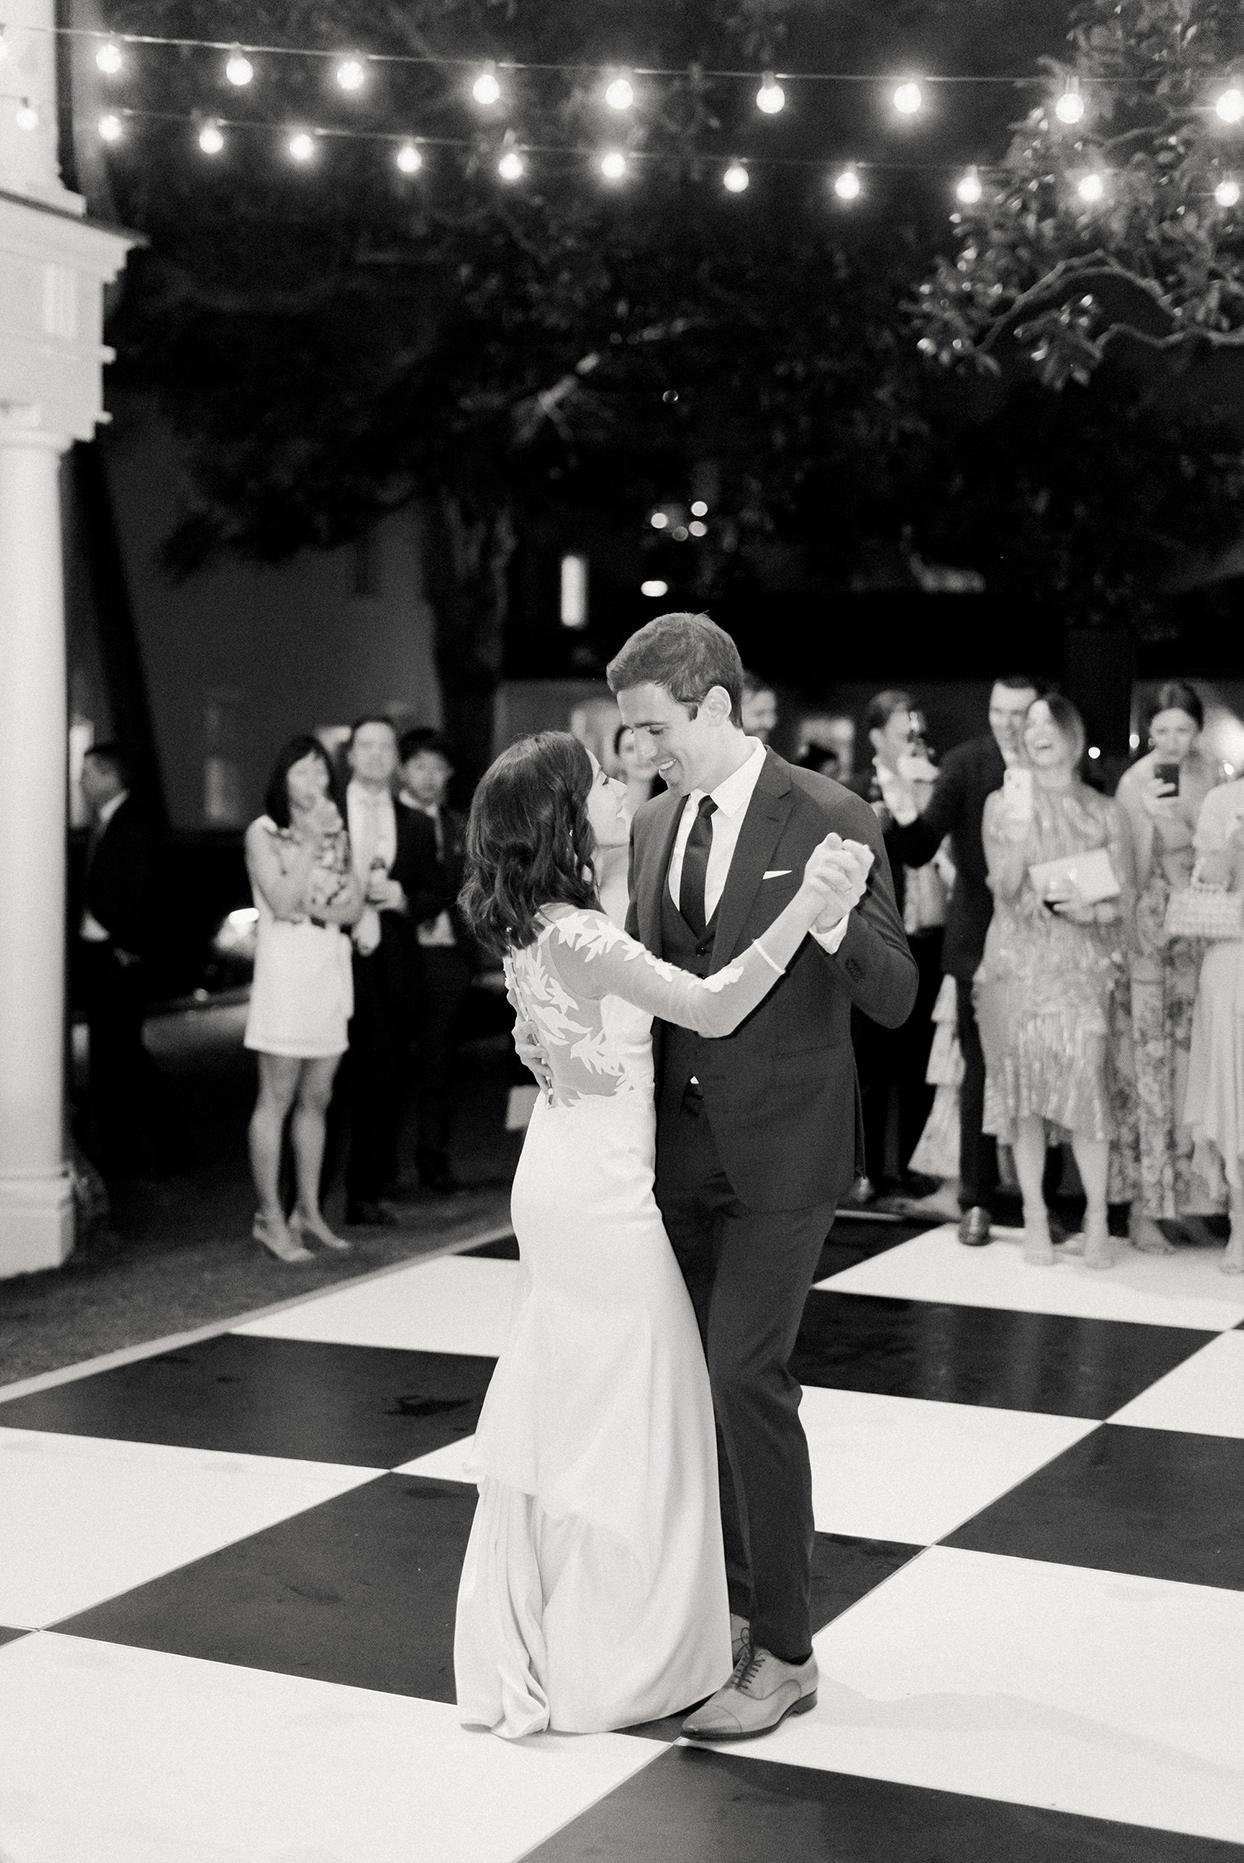 paula terence wedding couple first dance